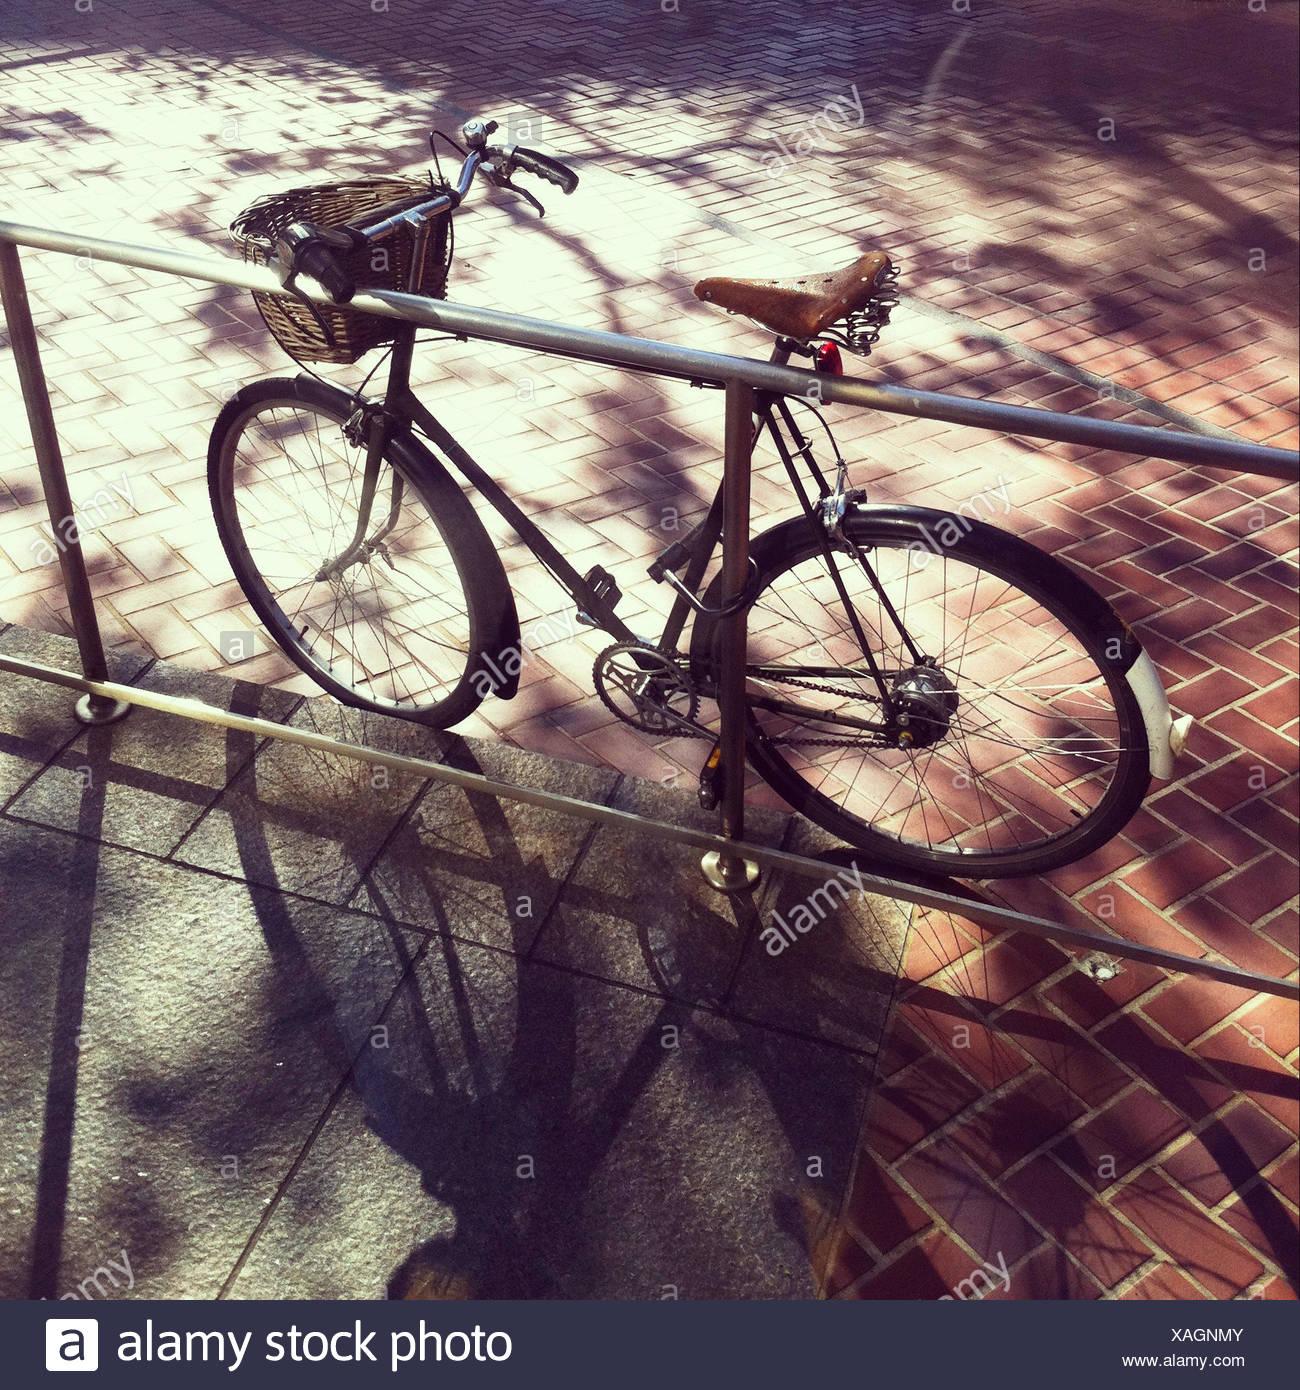 Bicycle locked to railing - Stock Image